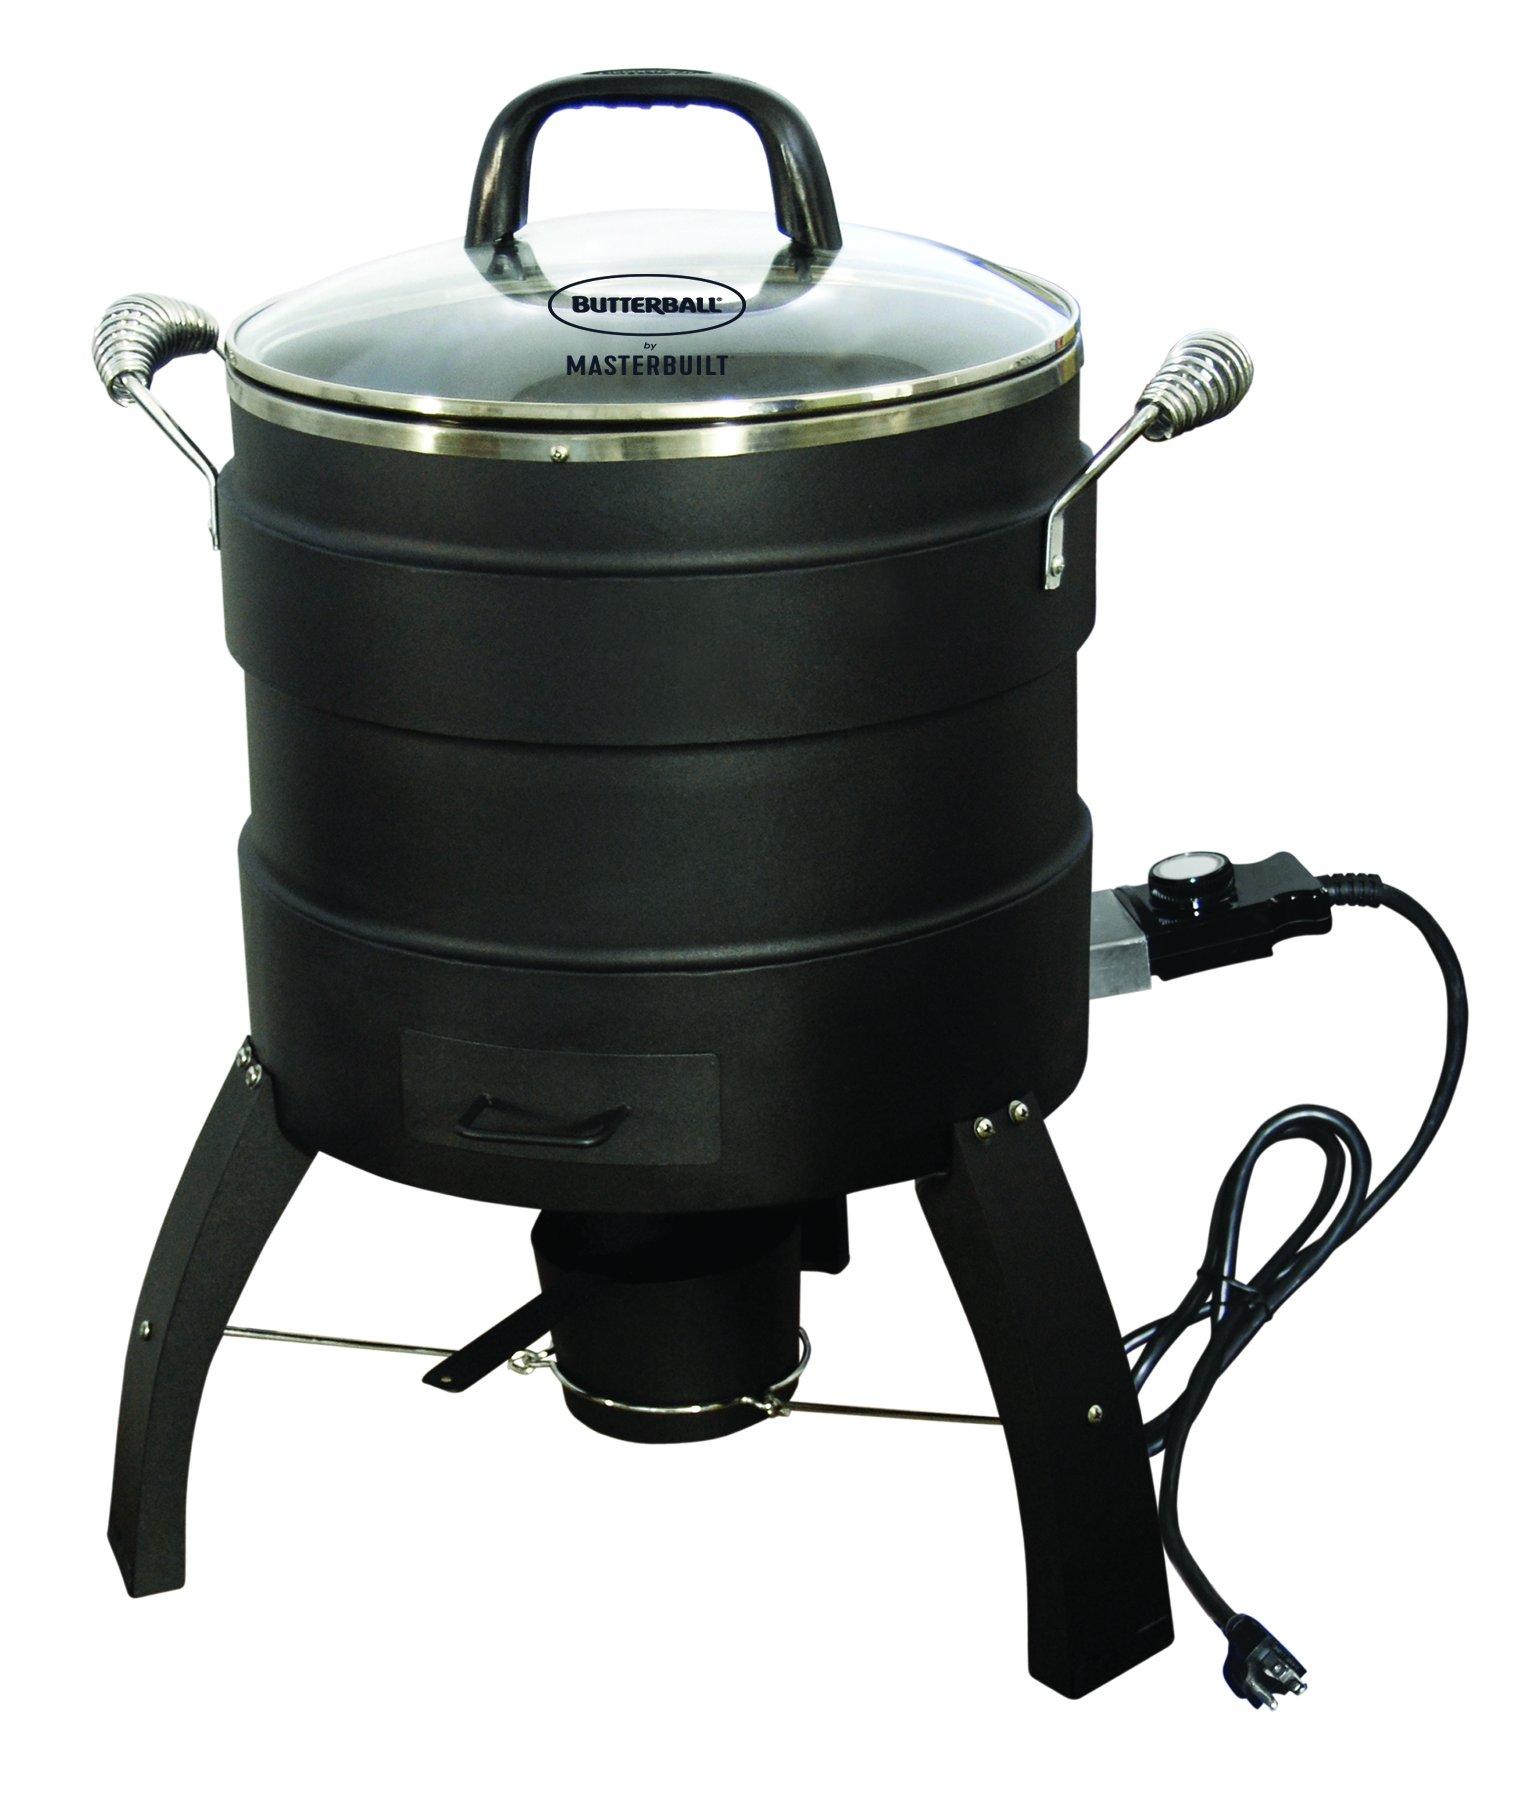 Masterbuilt MB23010809 Oil Free Roaster Electric Fryer, Black by Masterbuilt